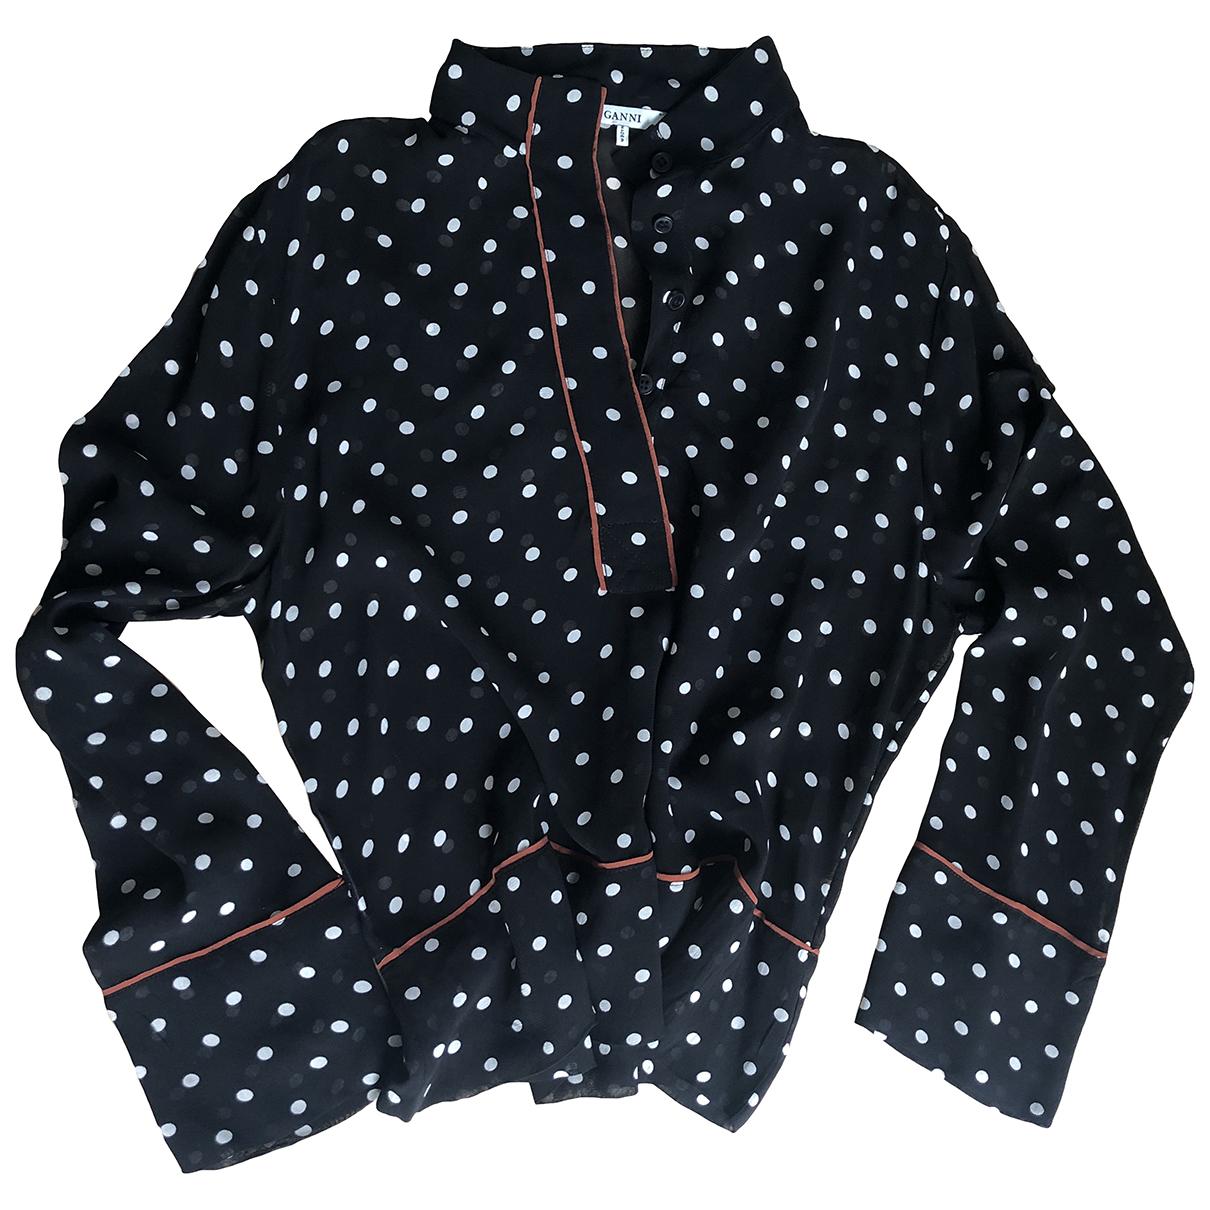 Ganni \N Anthracite Leather jacket for Women M International